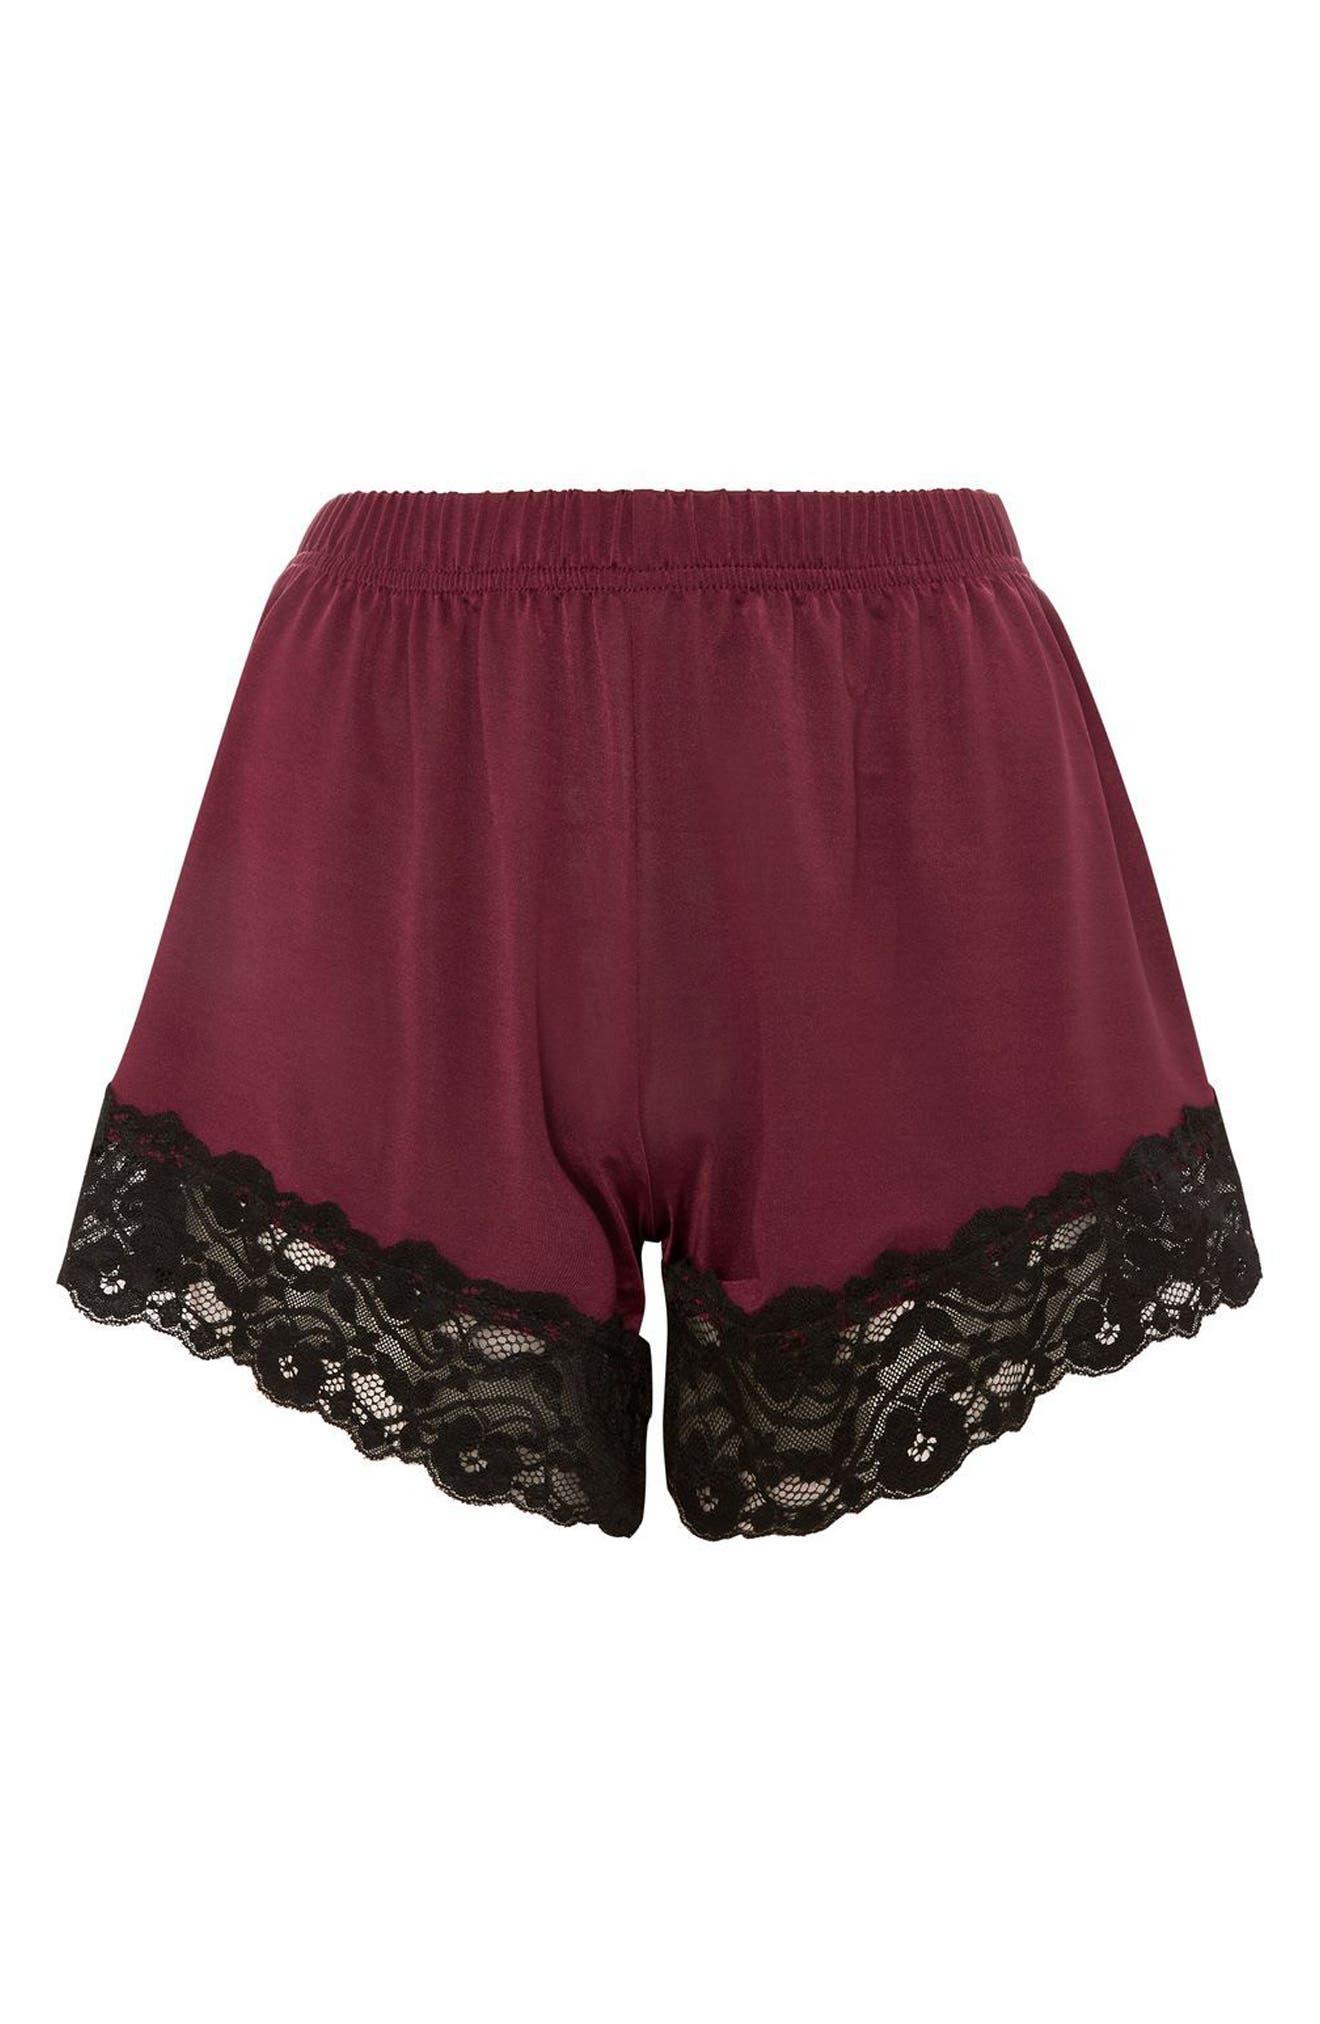 Jersey Satin & Lace Short Pajama Shorts,                             Alternate thumbnail 4, color,                             Berry Multi